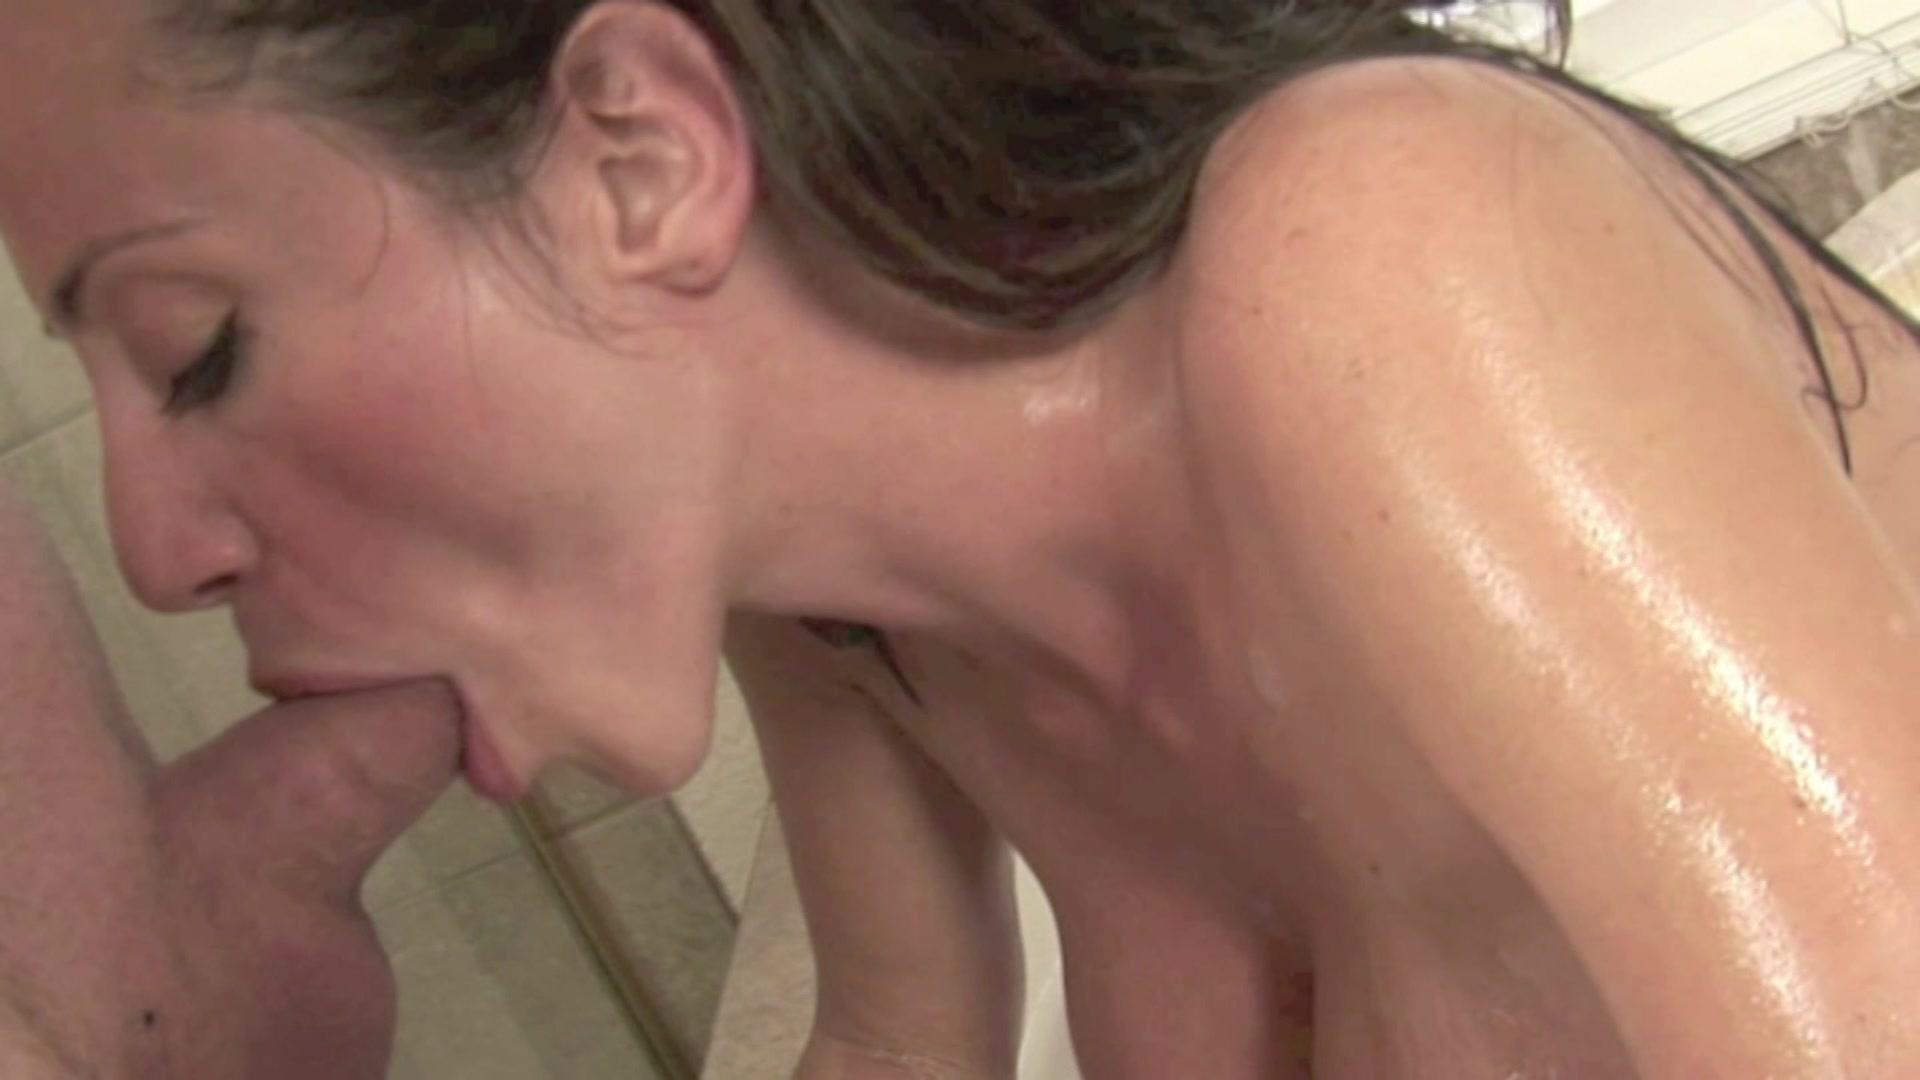 Sexy Ariella Ferrera Takes a Big Thick Cock in Her Mouth and Pussy Starring:  Ariella Ferrera